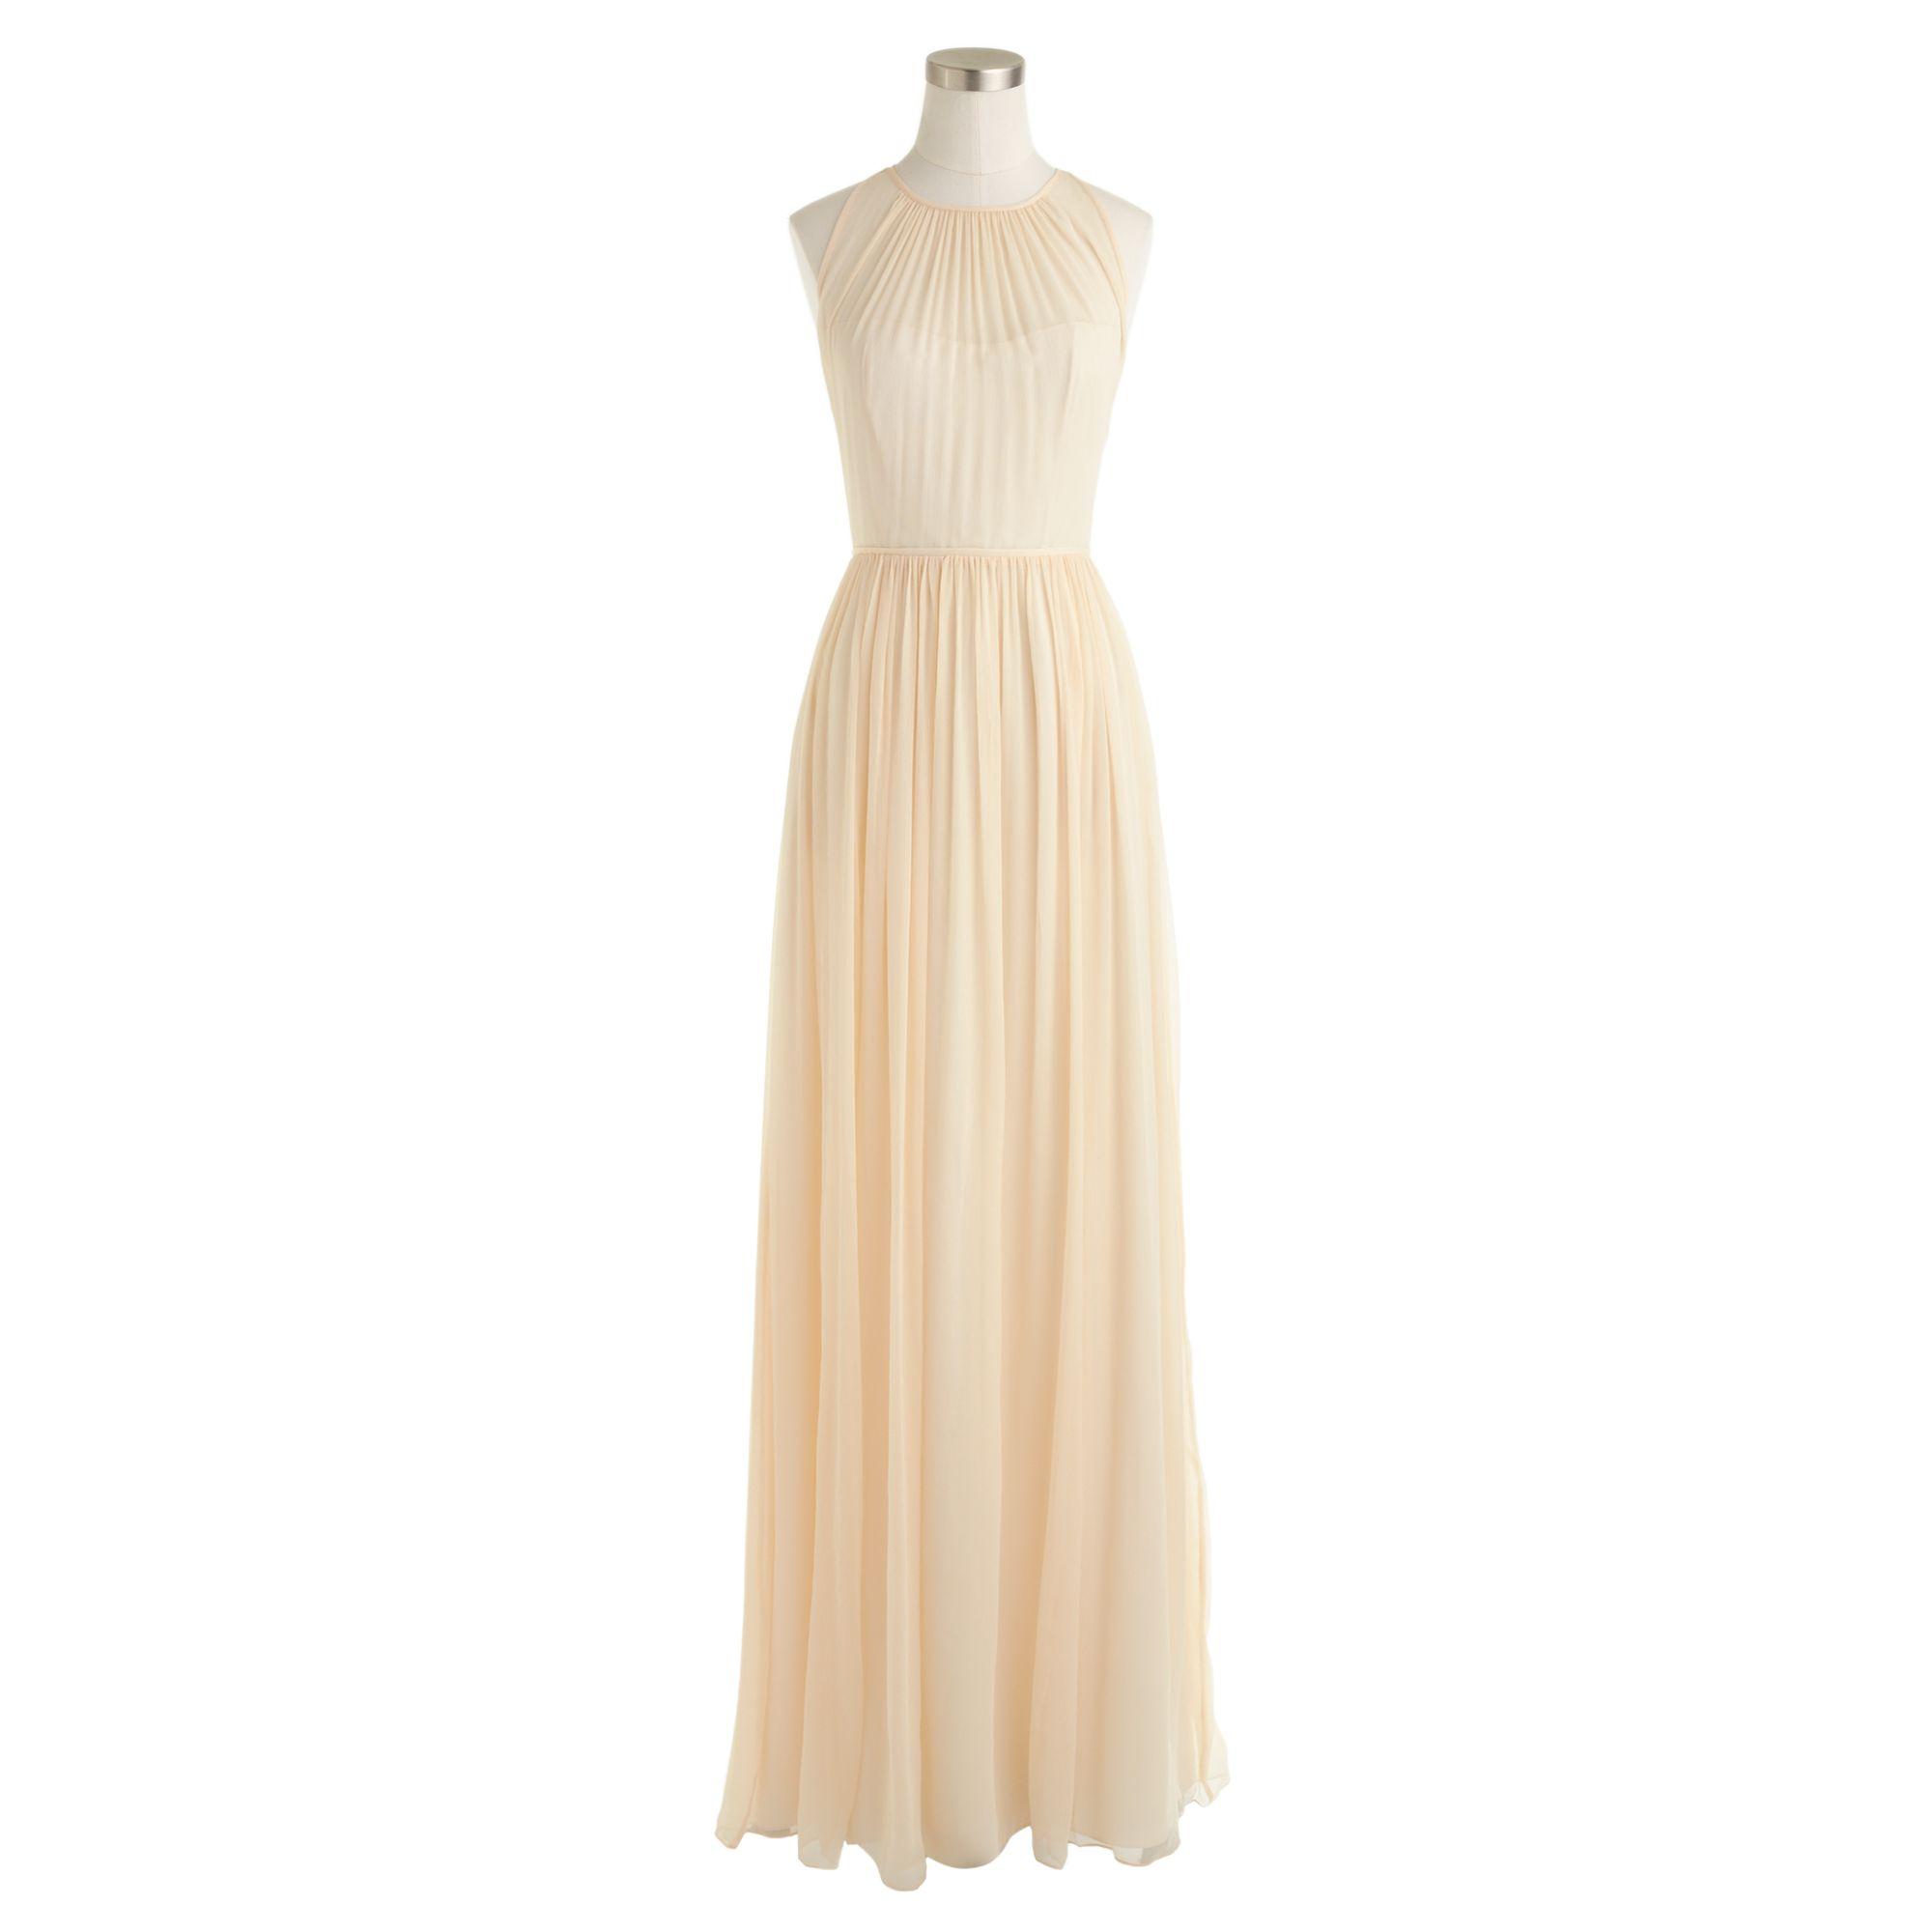 Megan Long Dress In Silk Chiffon In Gold Champagne